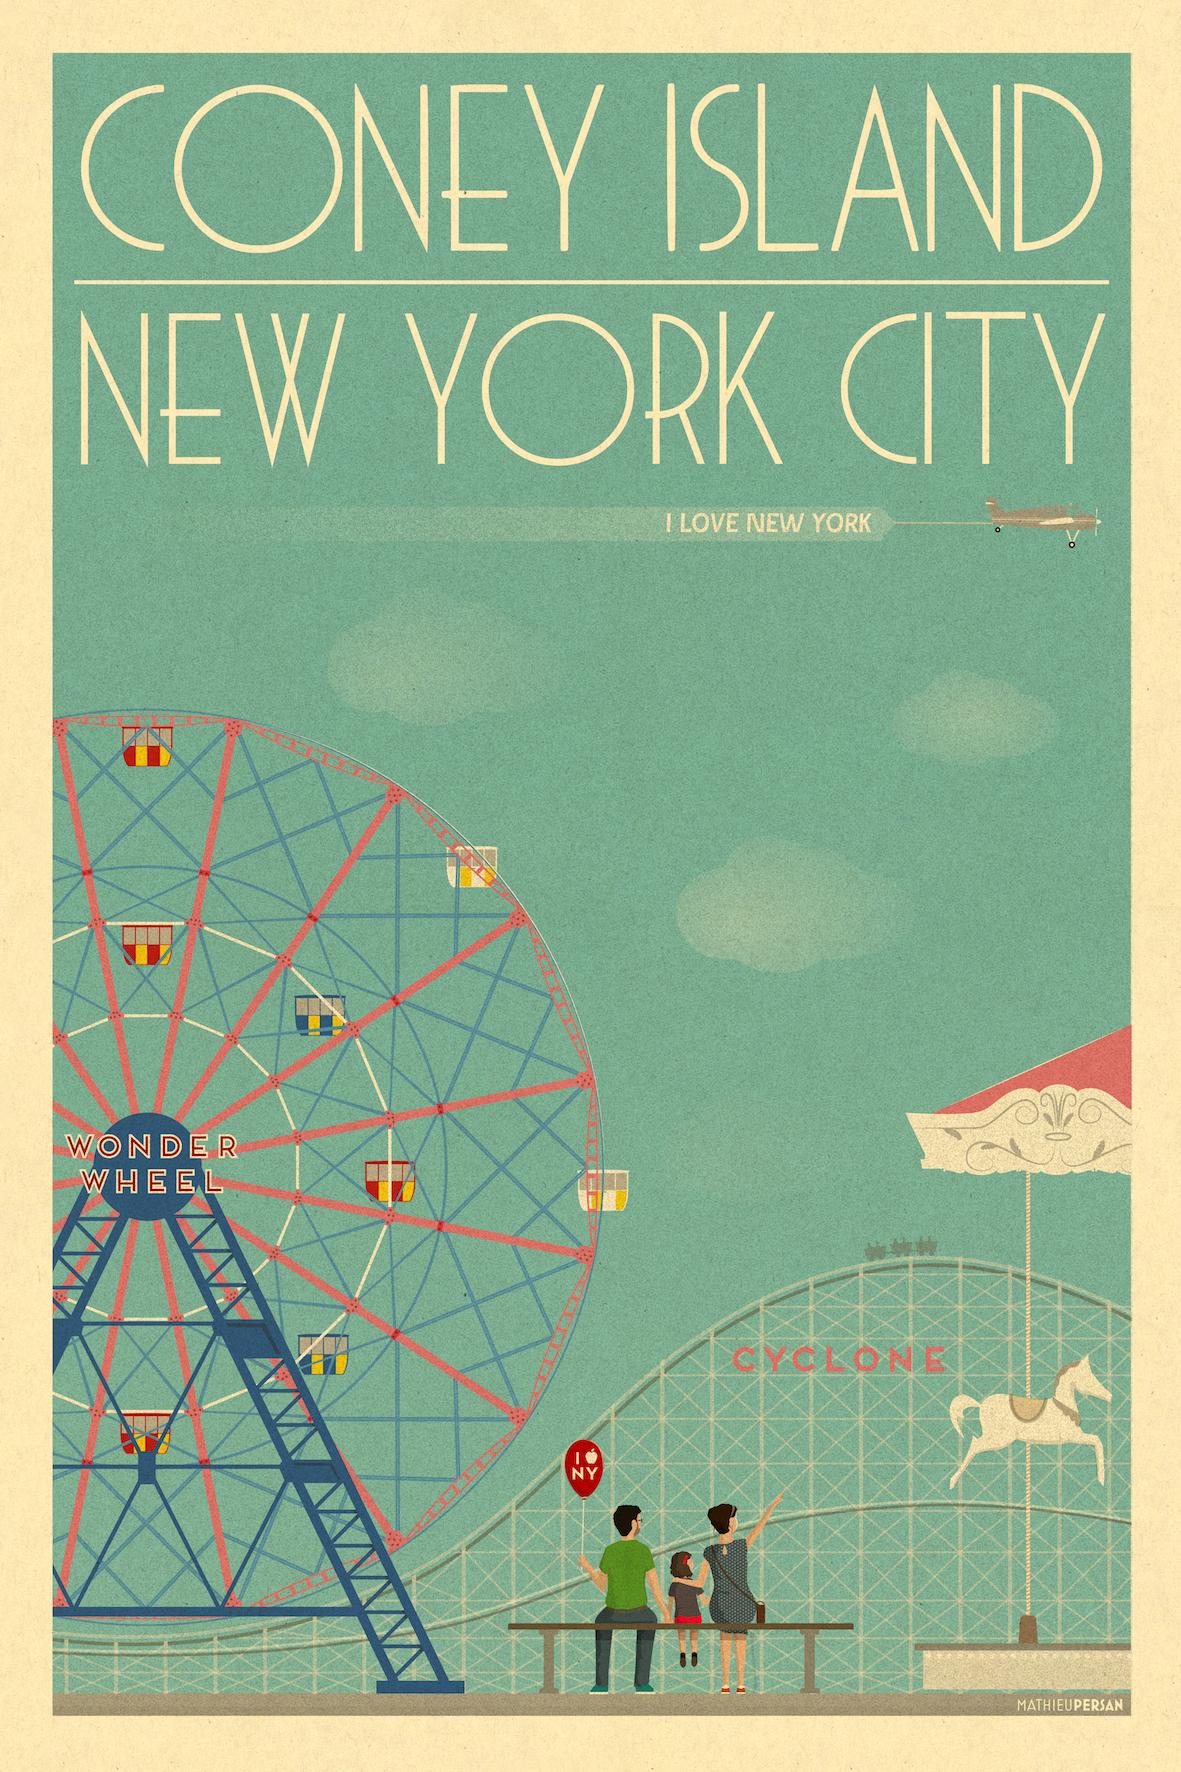 Coney Island D&M Vertical 30 45 bord blanc-02 copy.jpg